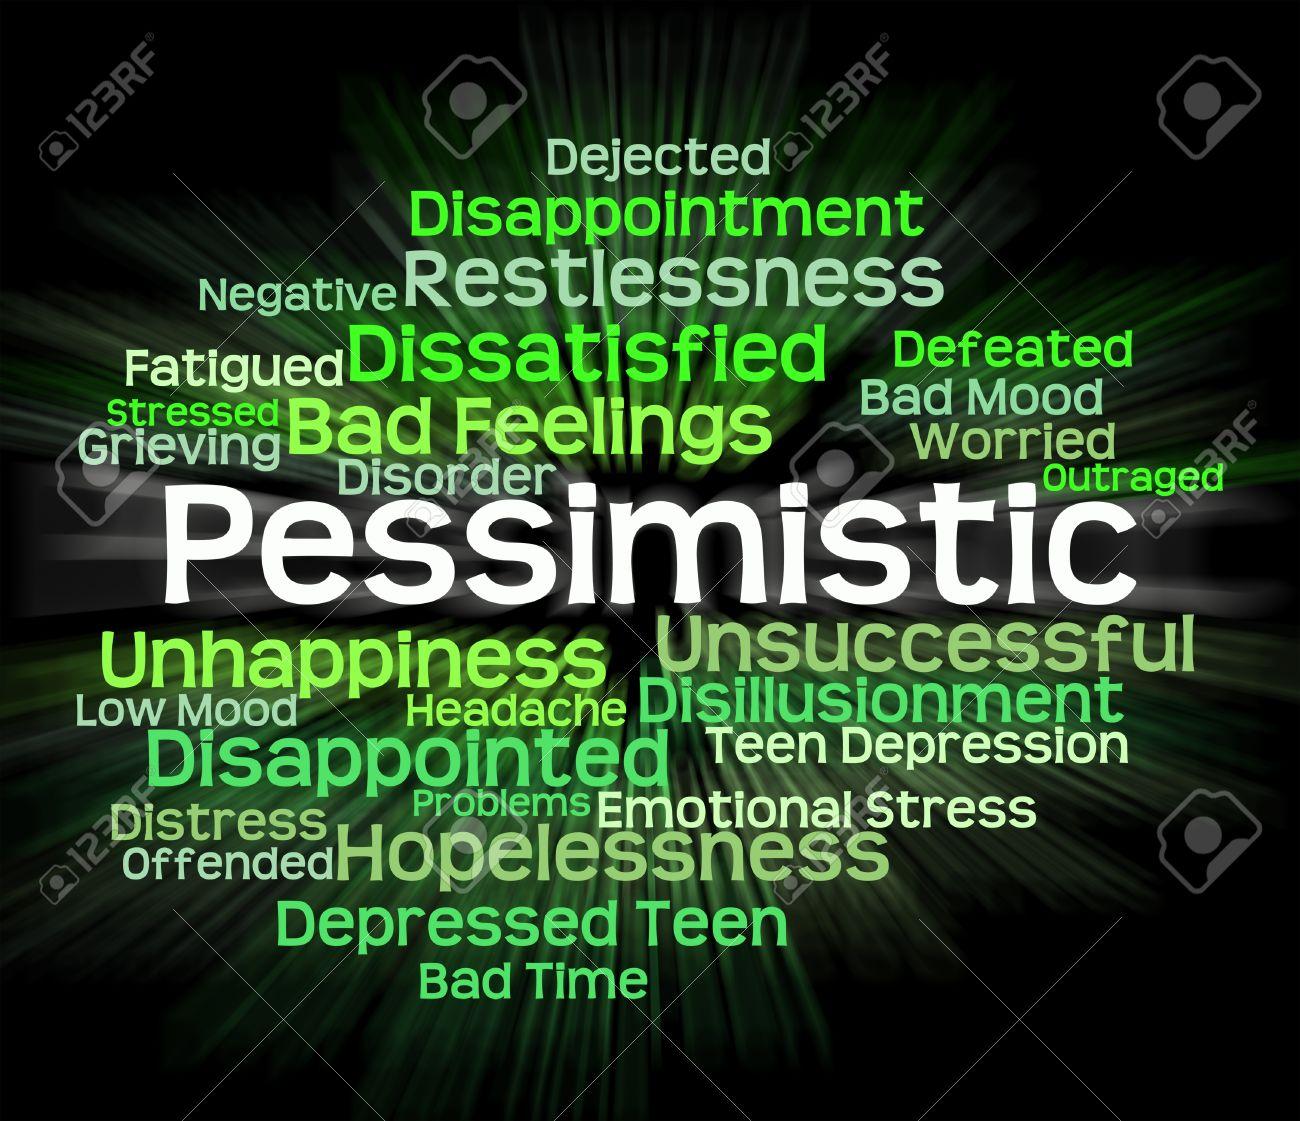 悲観的な言葉意味宿命論的言葉と...